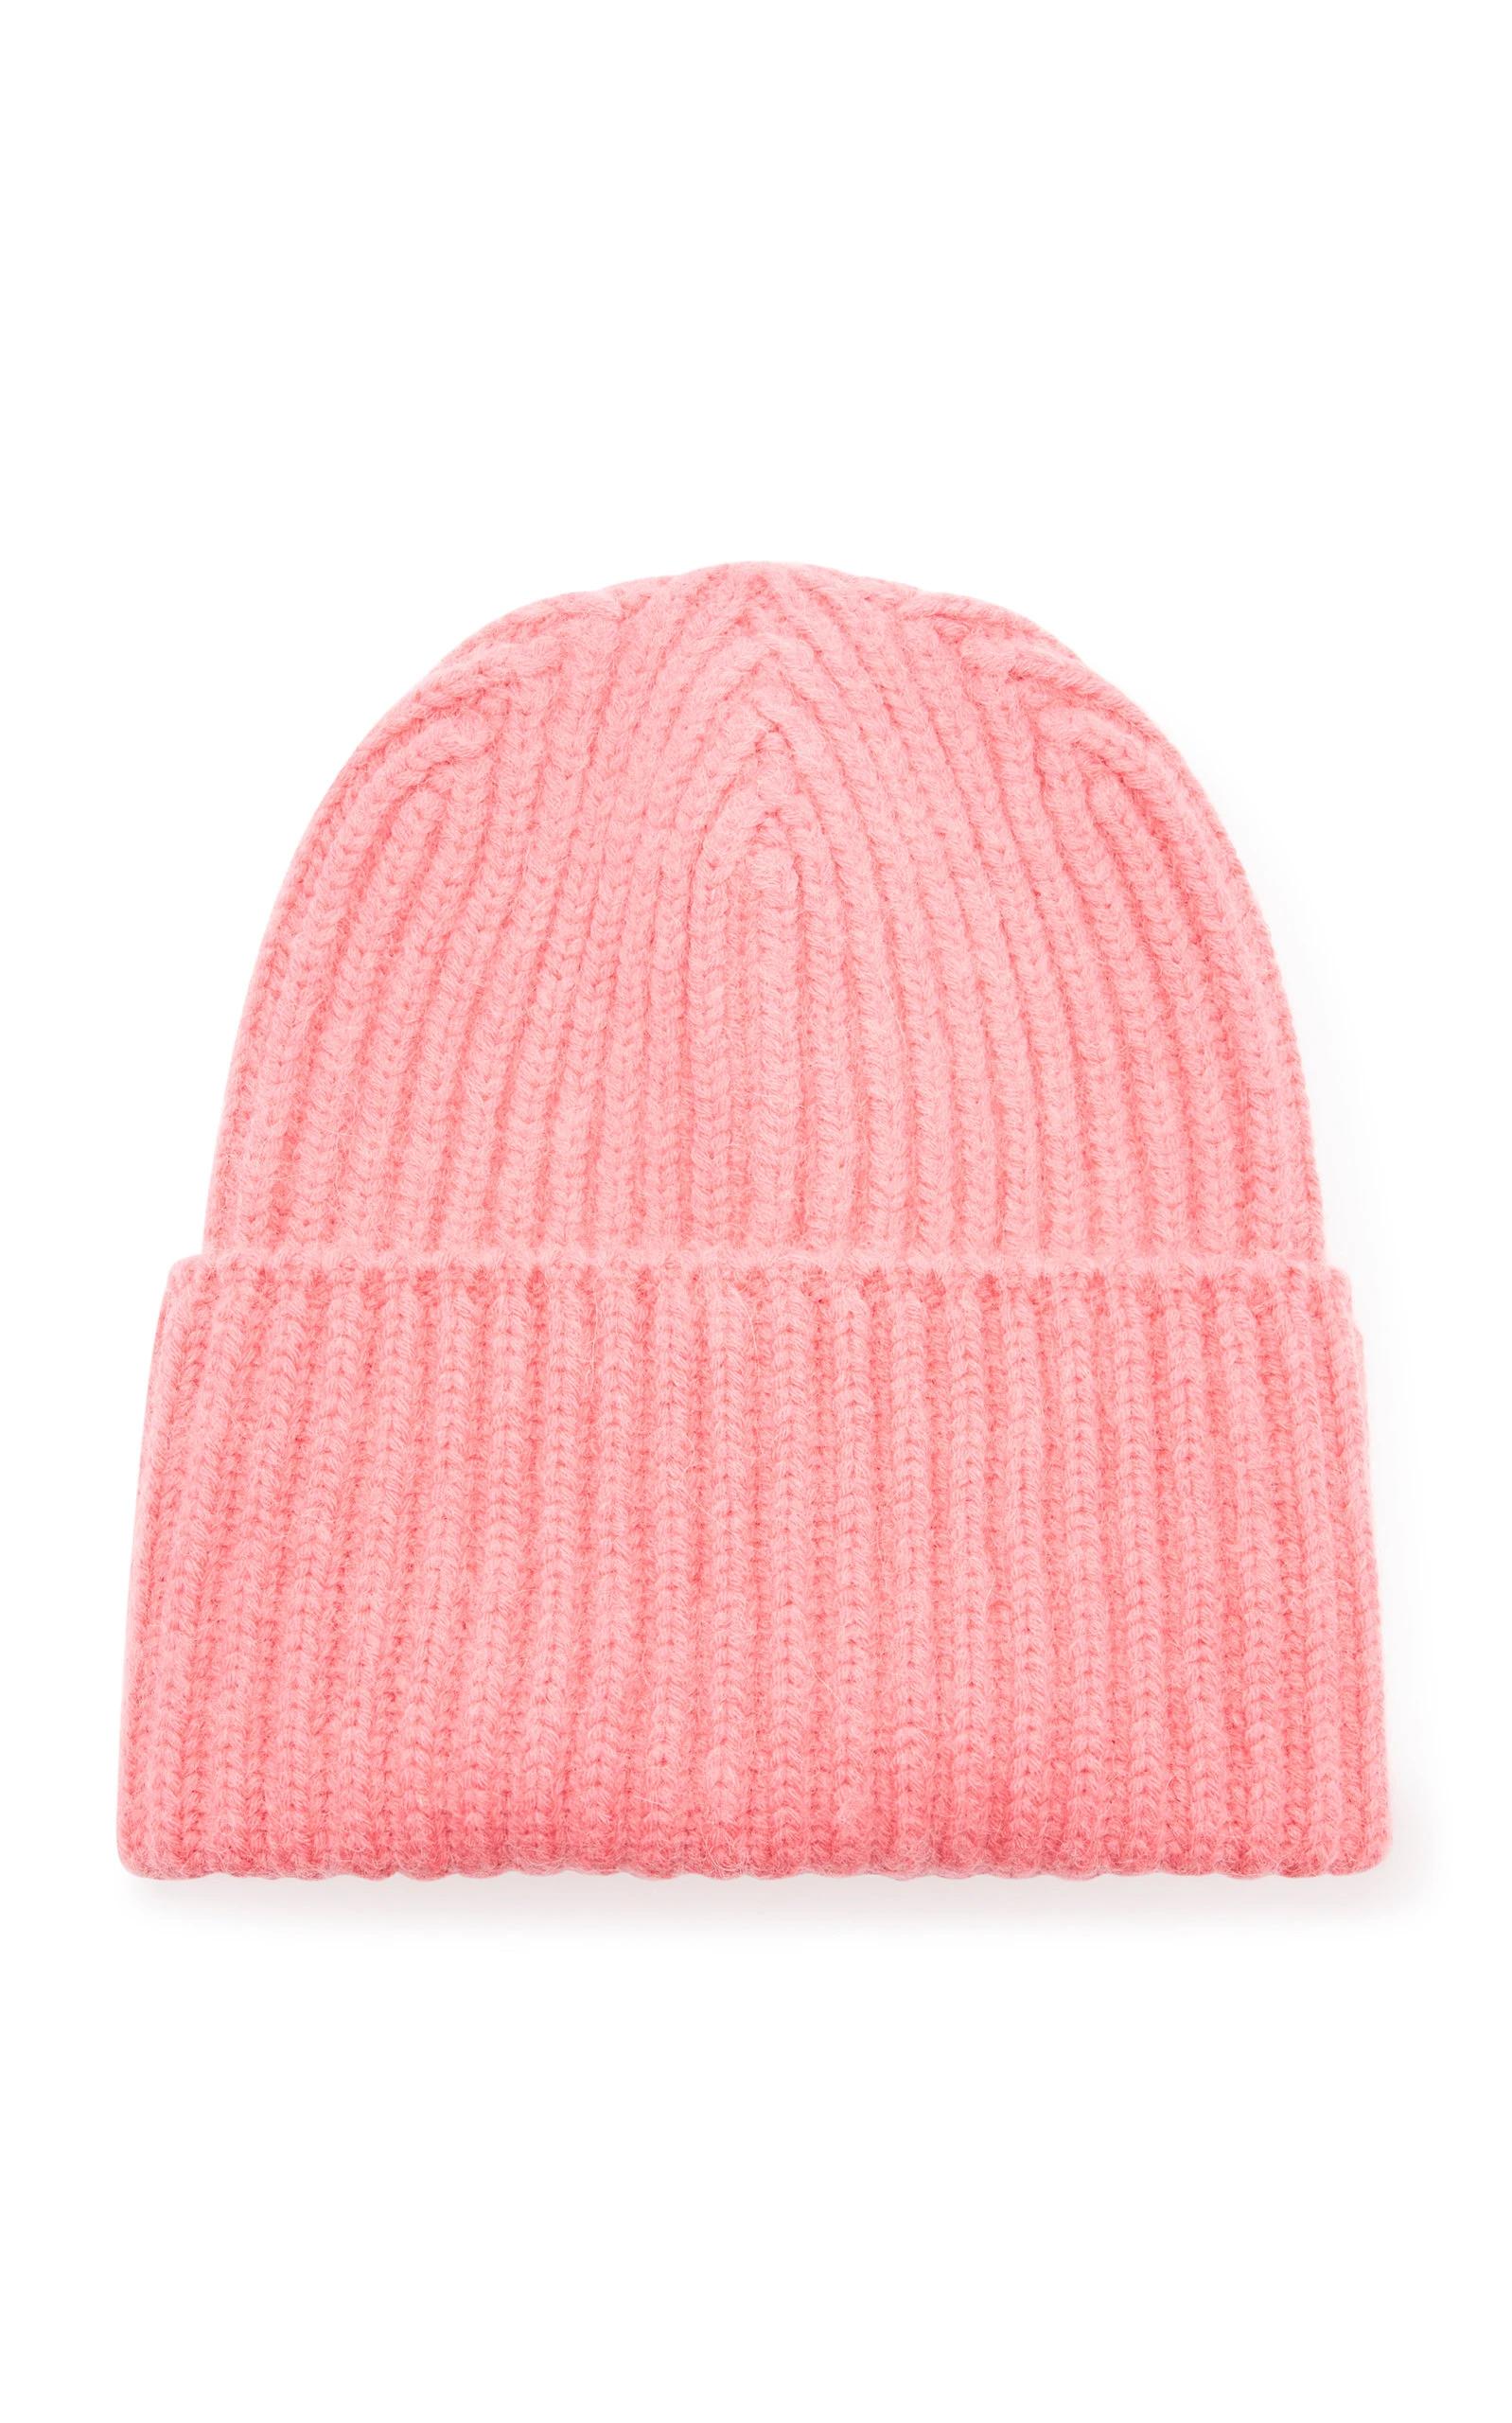 Cute Winter Hats For Women 2019 All Hat Types 63794c14febb